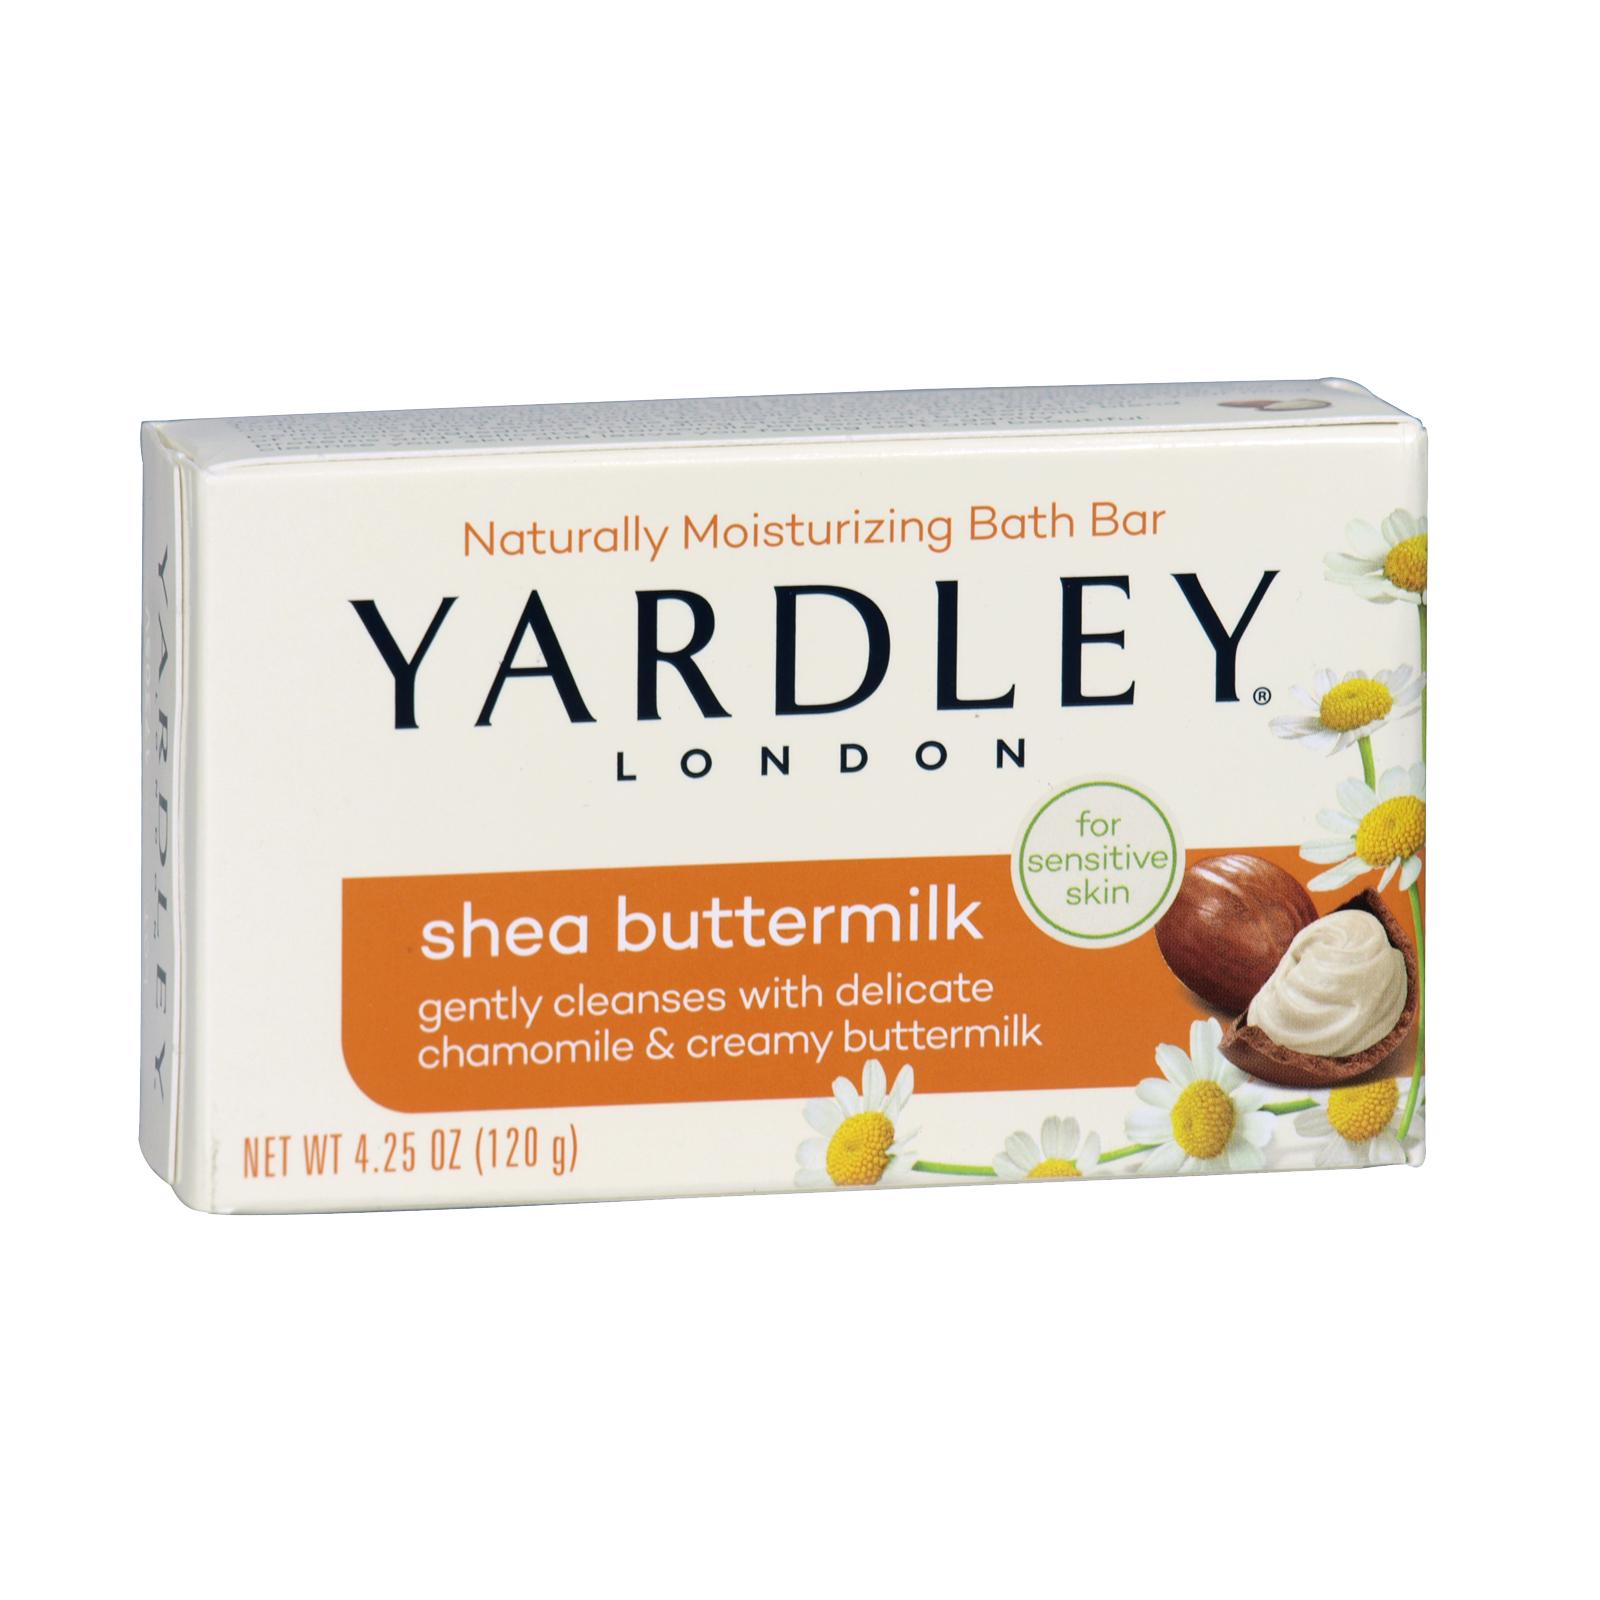 YARDLEY SOAP BOXED 120GM SHEA BUTTERMILK